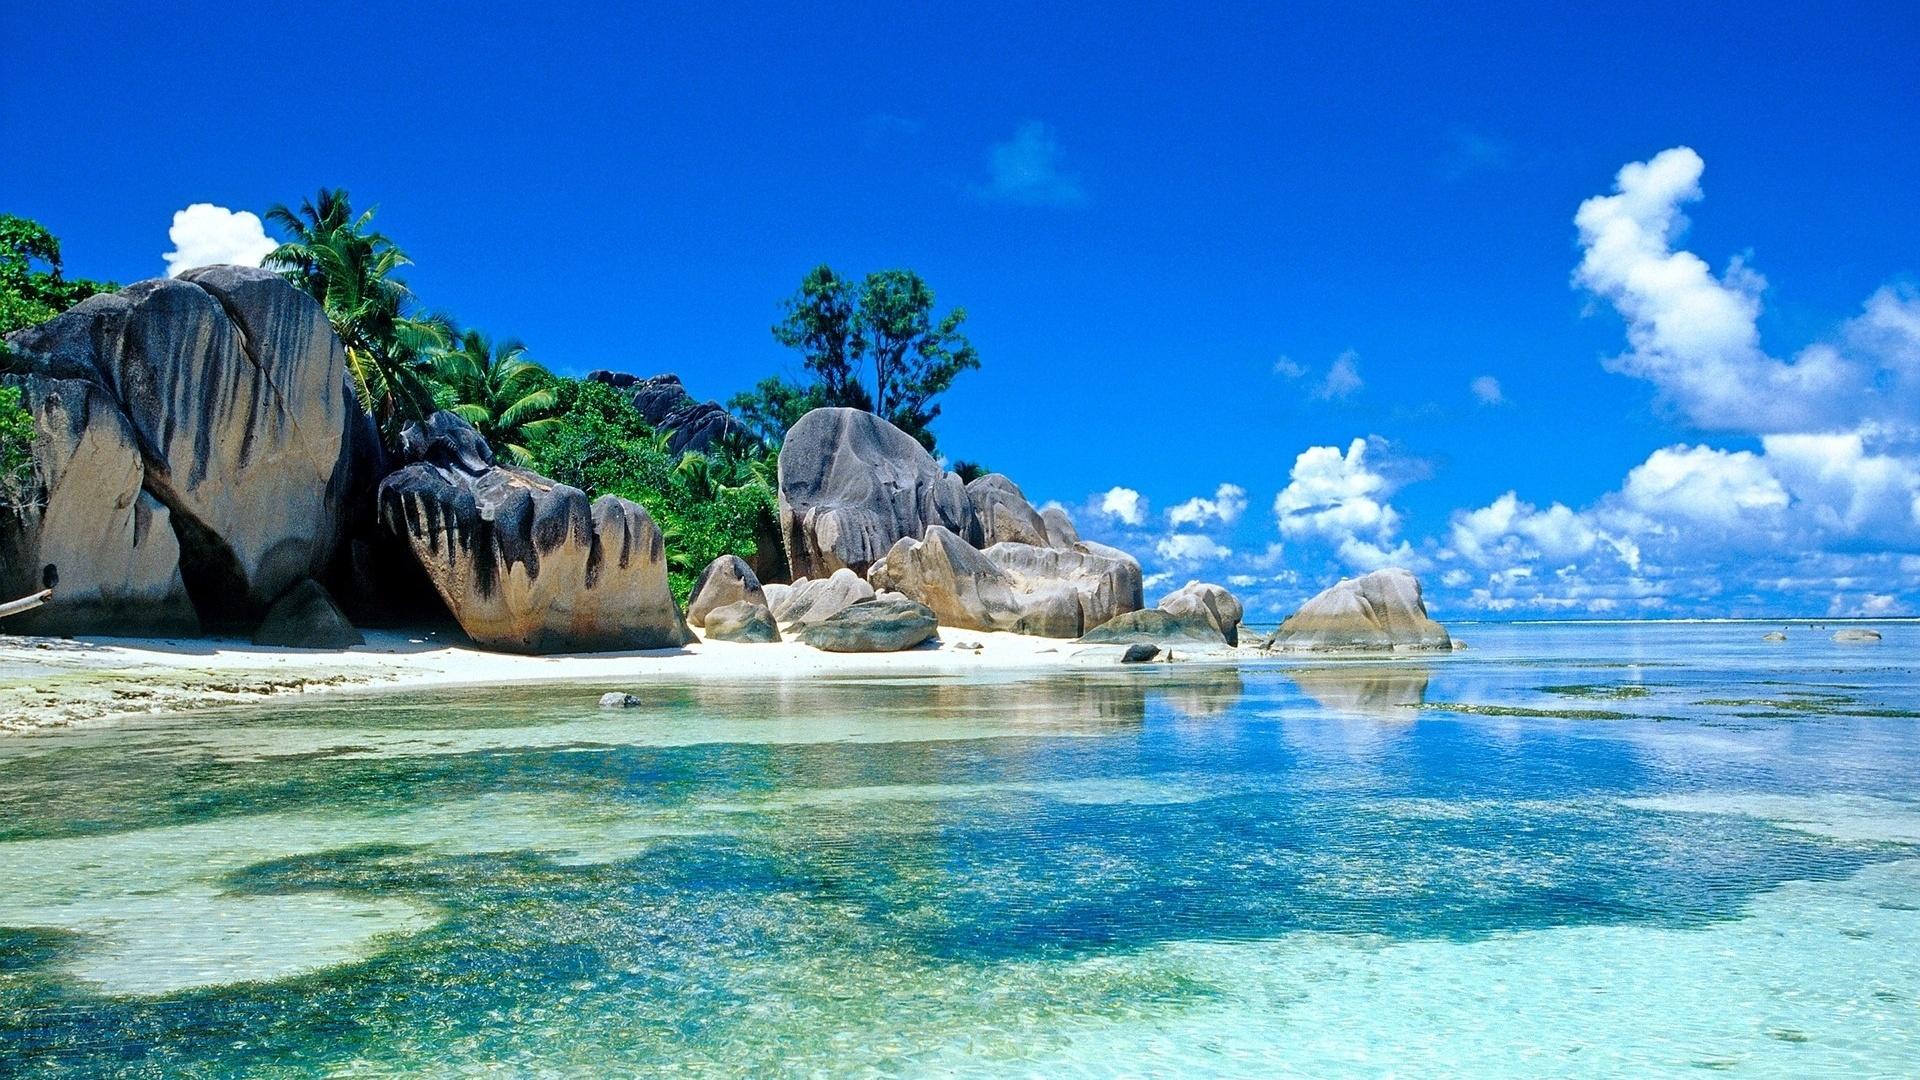 Paradise Island Full Hd Desktop Wallpapers 1080p